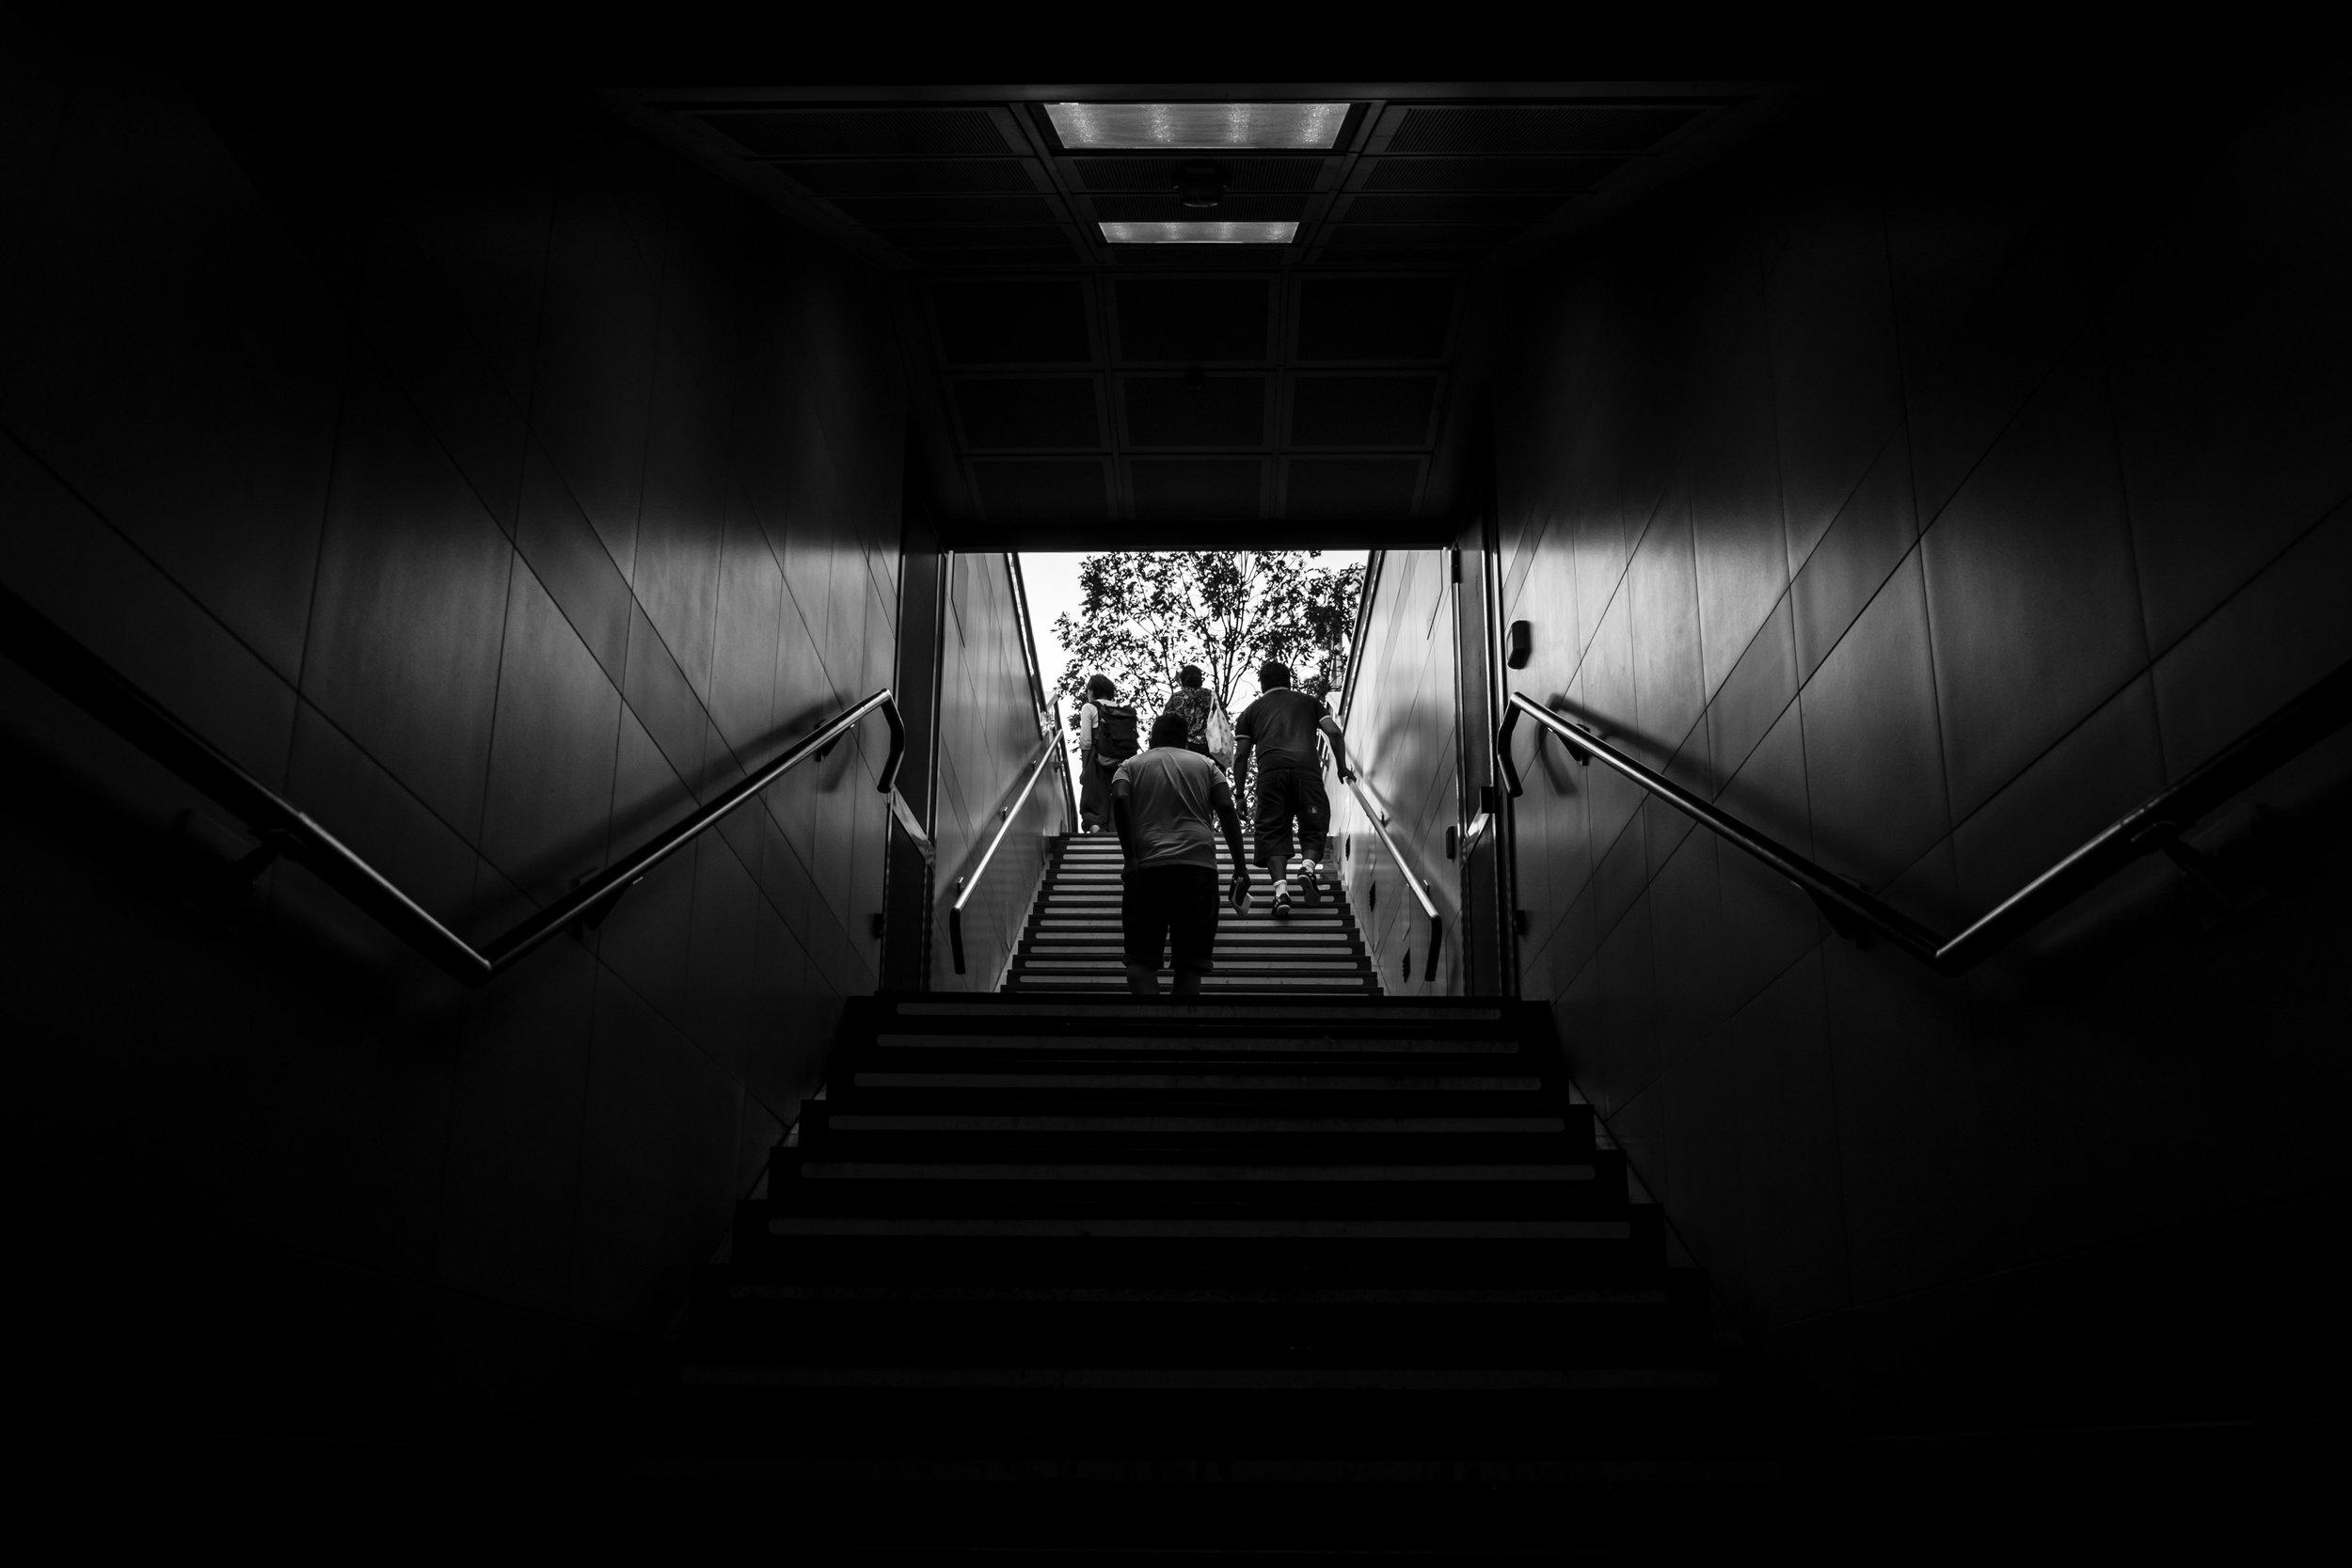 PHOTOGRAPHY: Mirko Fin • Fujifilm X-T2 • XF18-55mm Ƒ/2.8-4 R LM OIS @ 18mm • Ƒ/3.2 • 1/500 • ISO 200